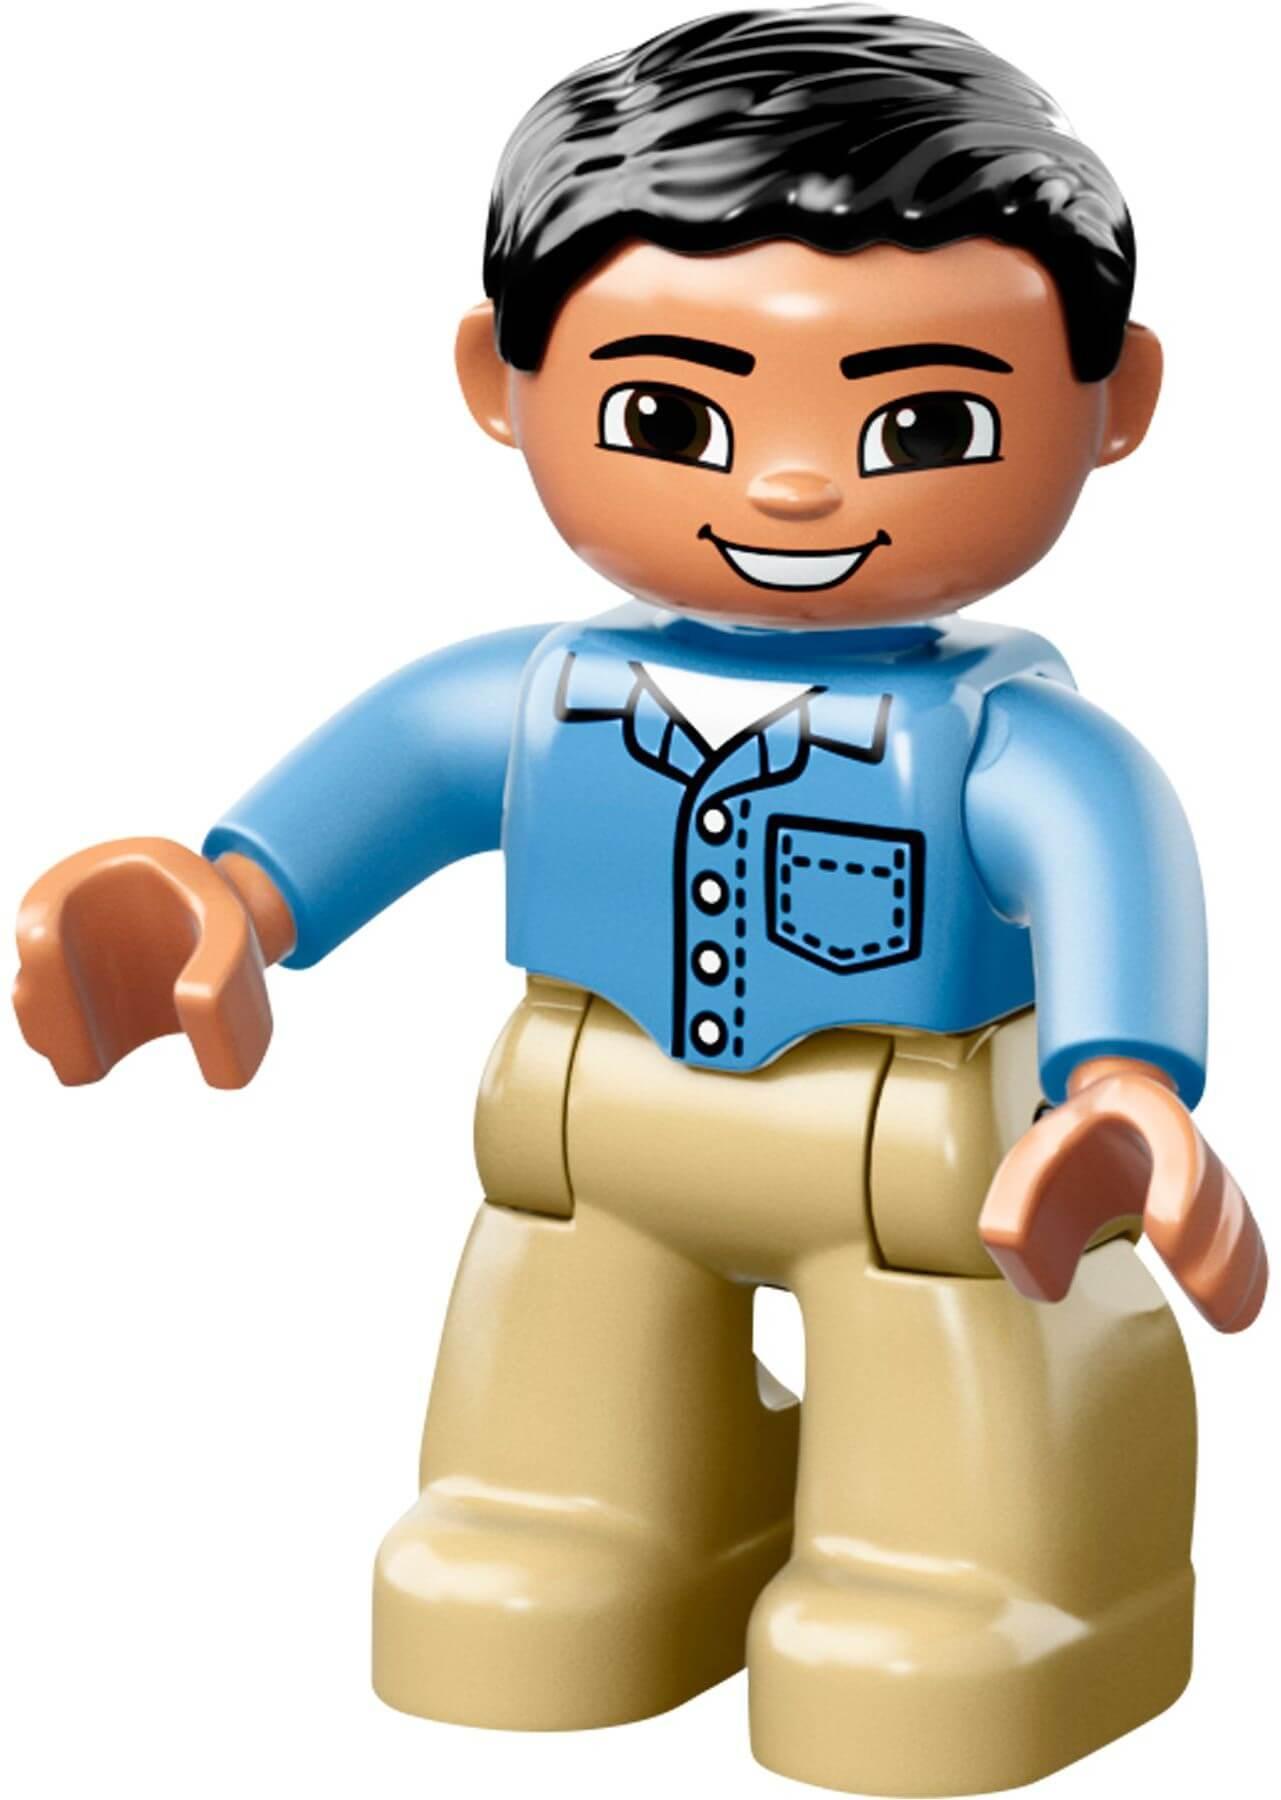 Mua đồ chơi LEGO 10546 - LEGO DUPLO 10546 - Cửa hàng của Bé (LEGO DUPLO My First Shop 10546)